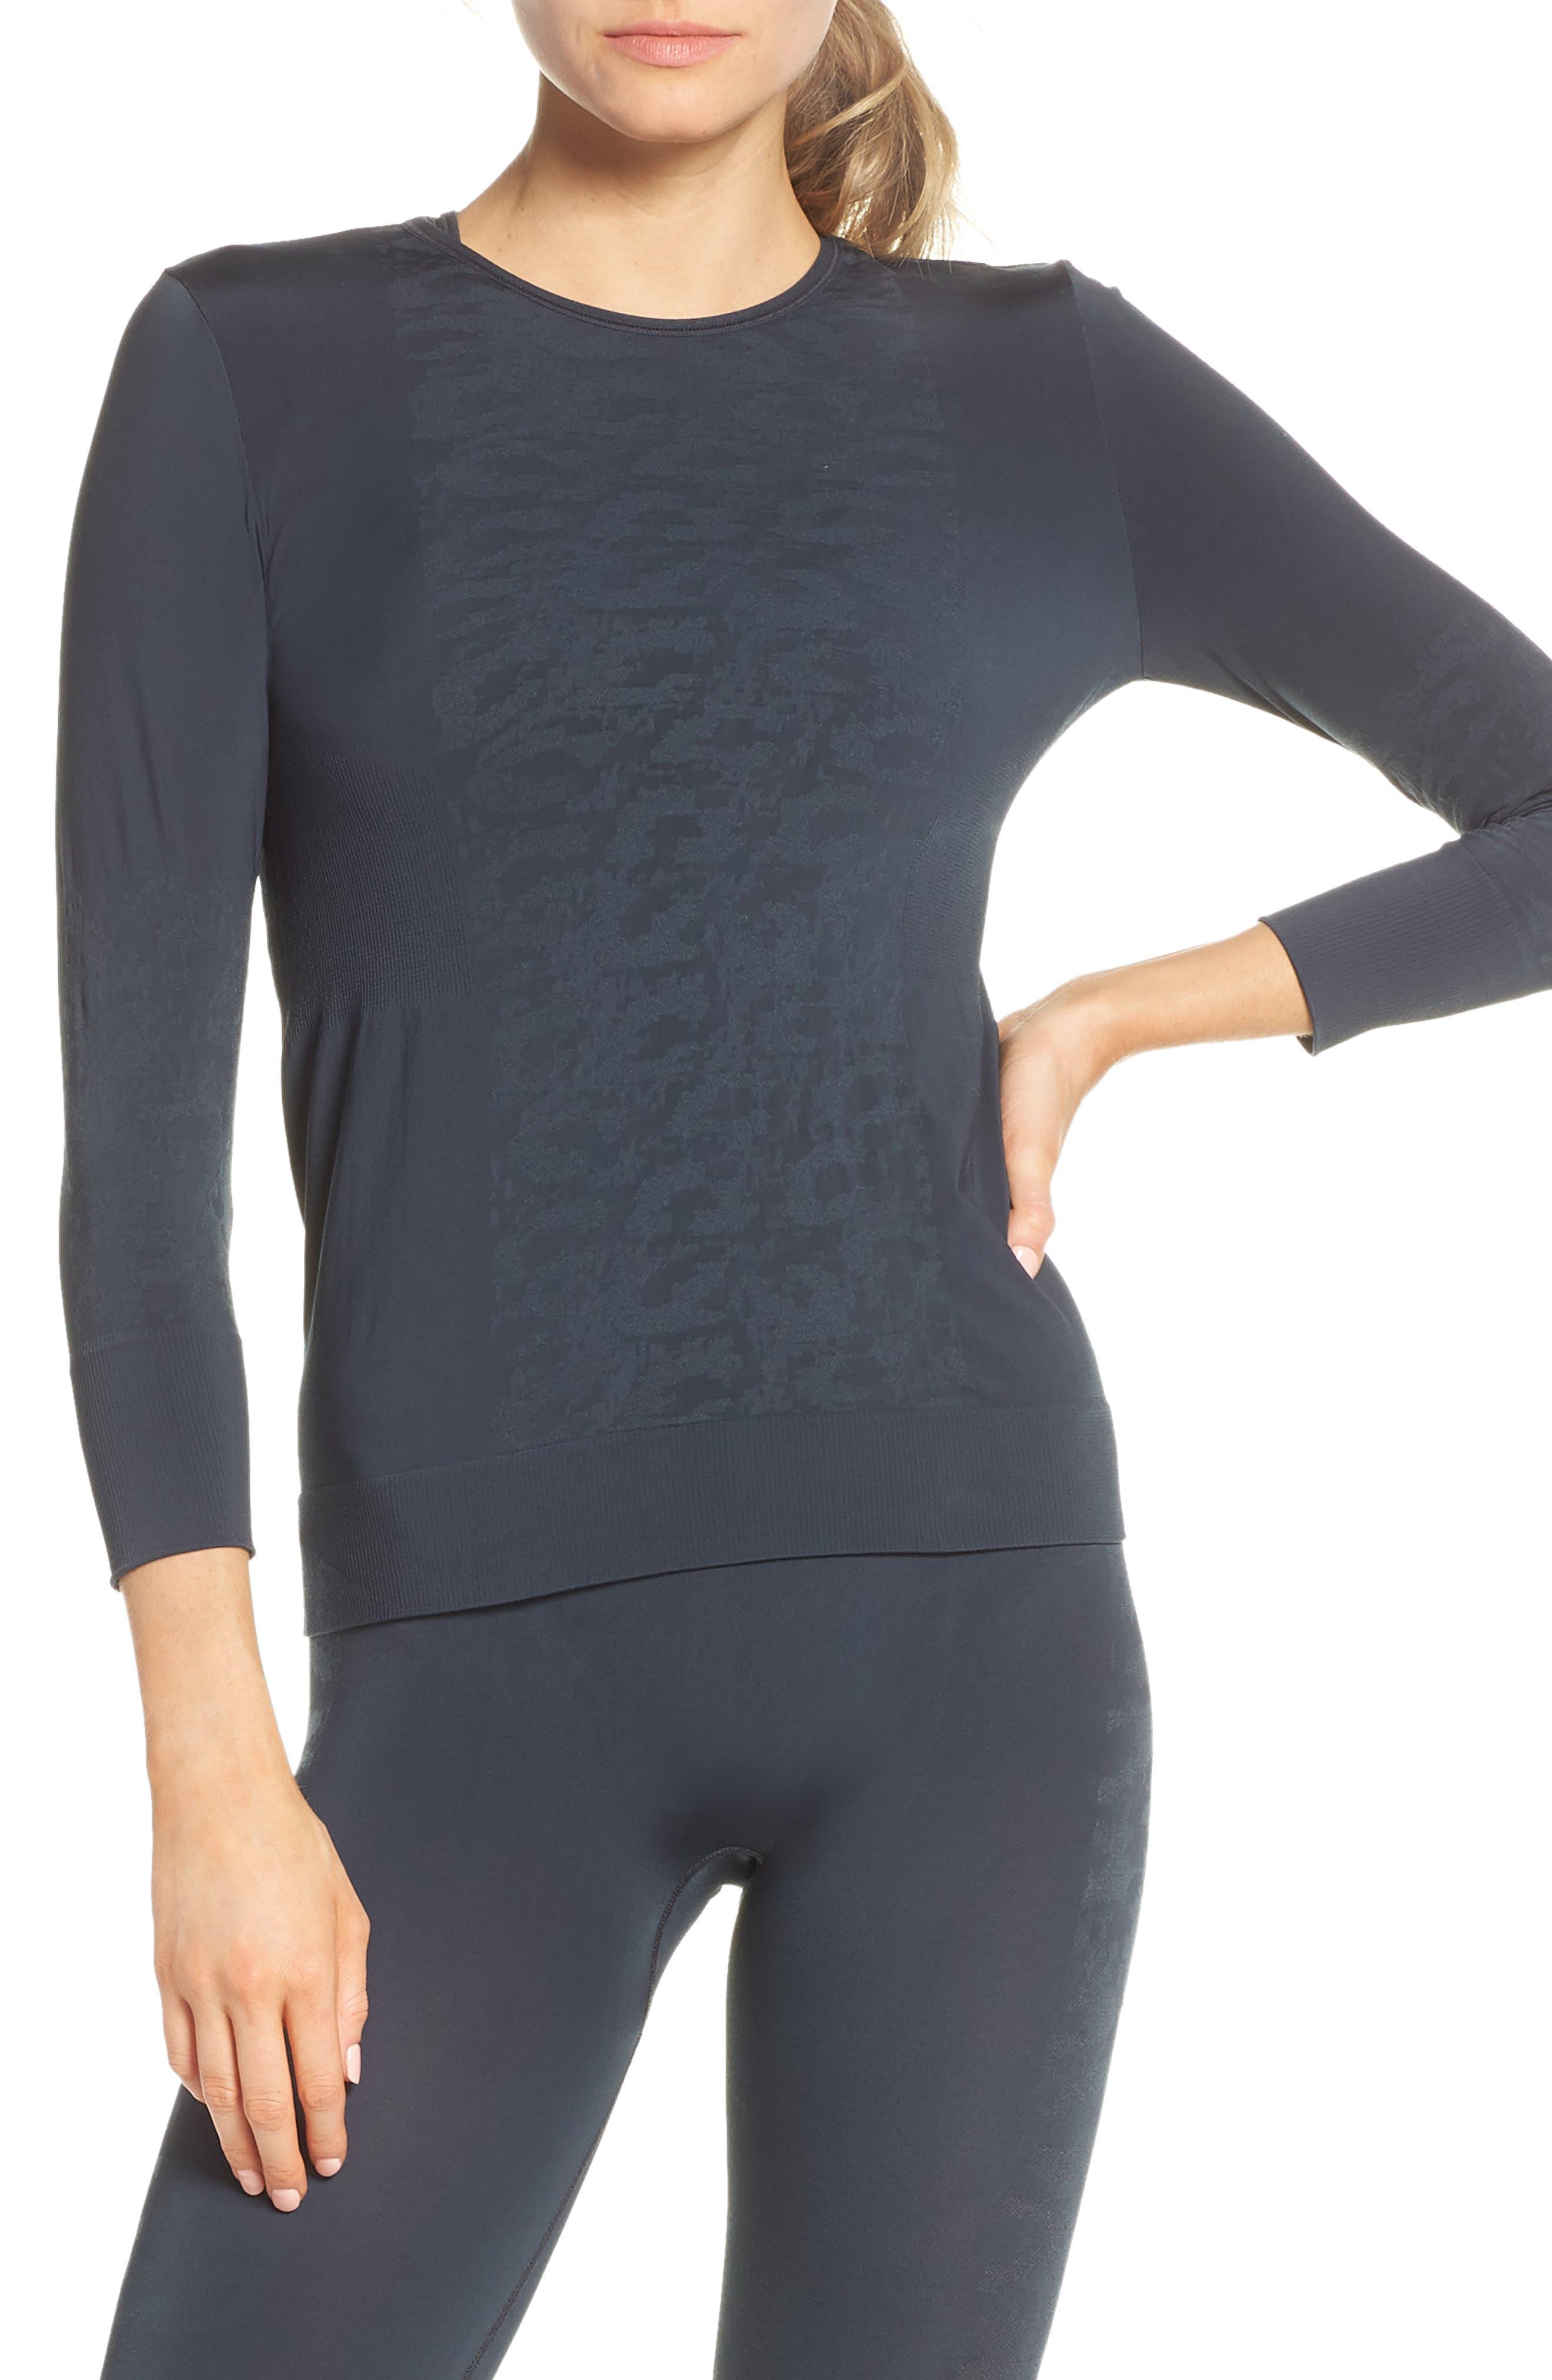 size 40 b7cd8 a4e72 Women s Adidas By Stella Mccartney Clothing   Nordstrom